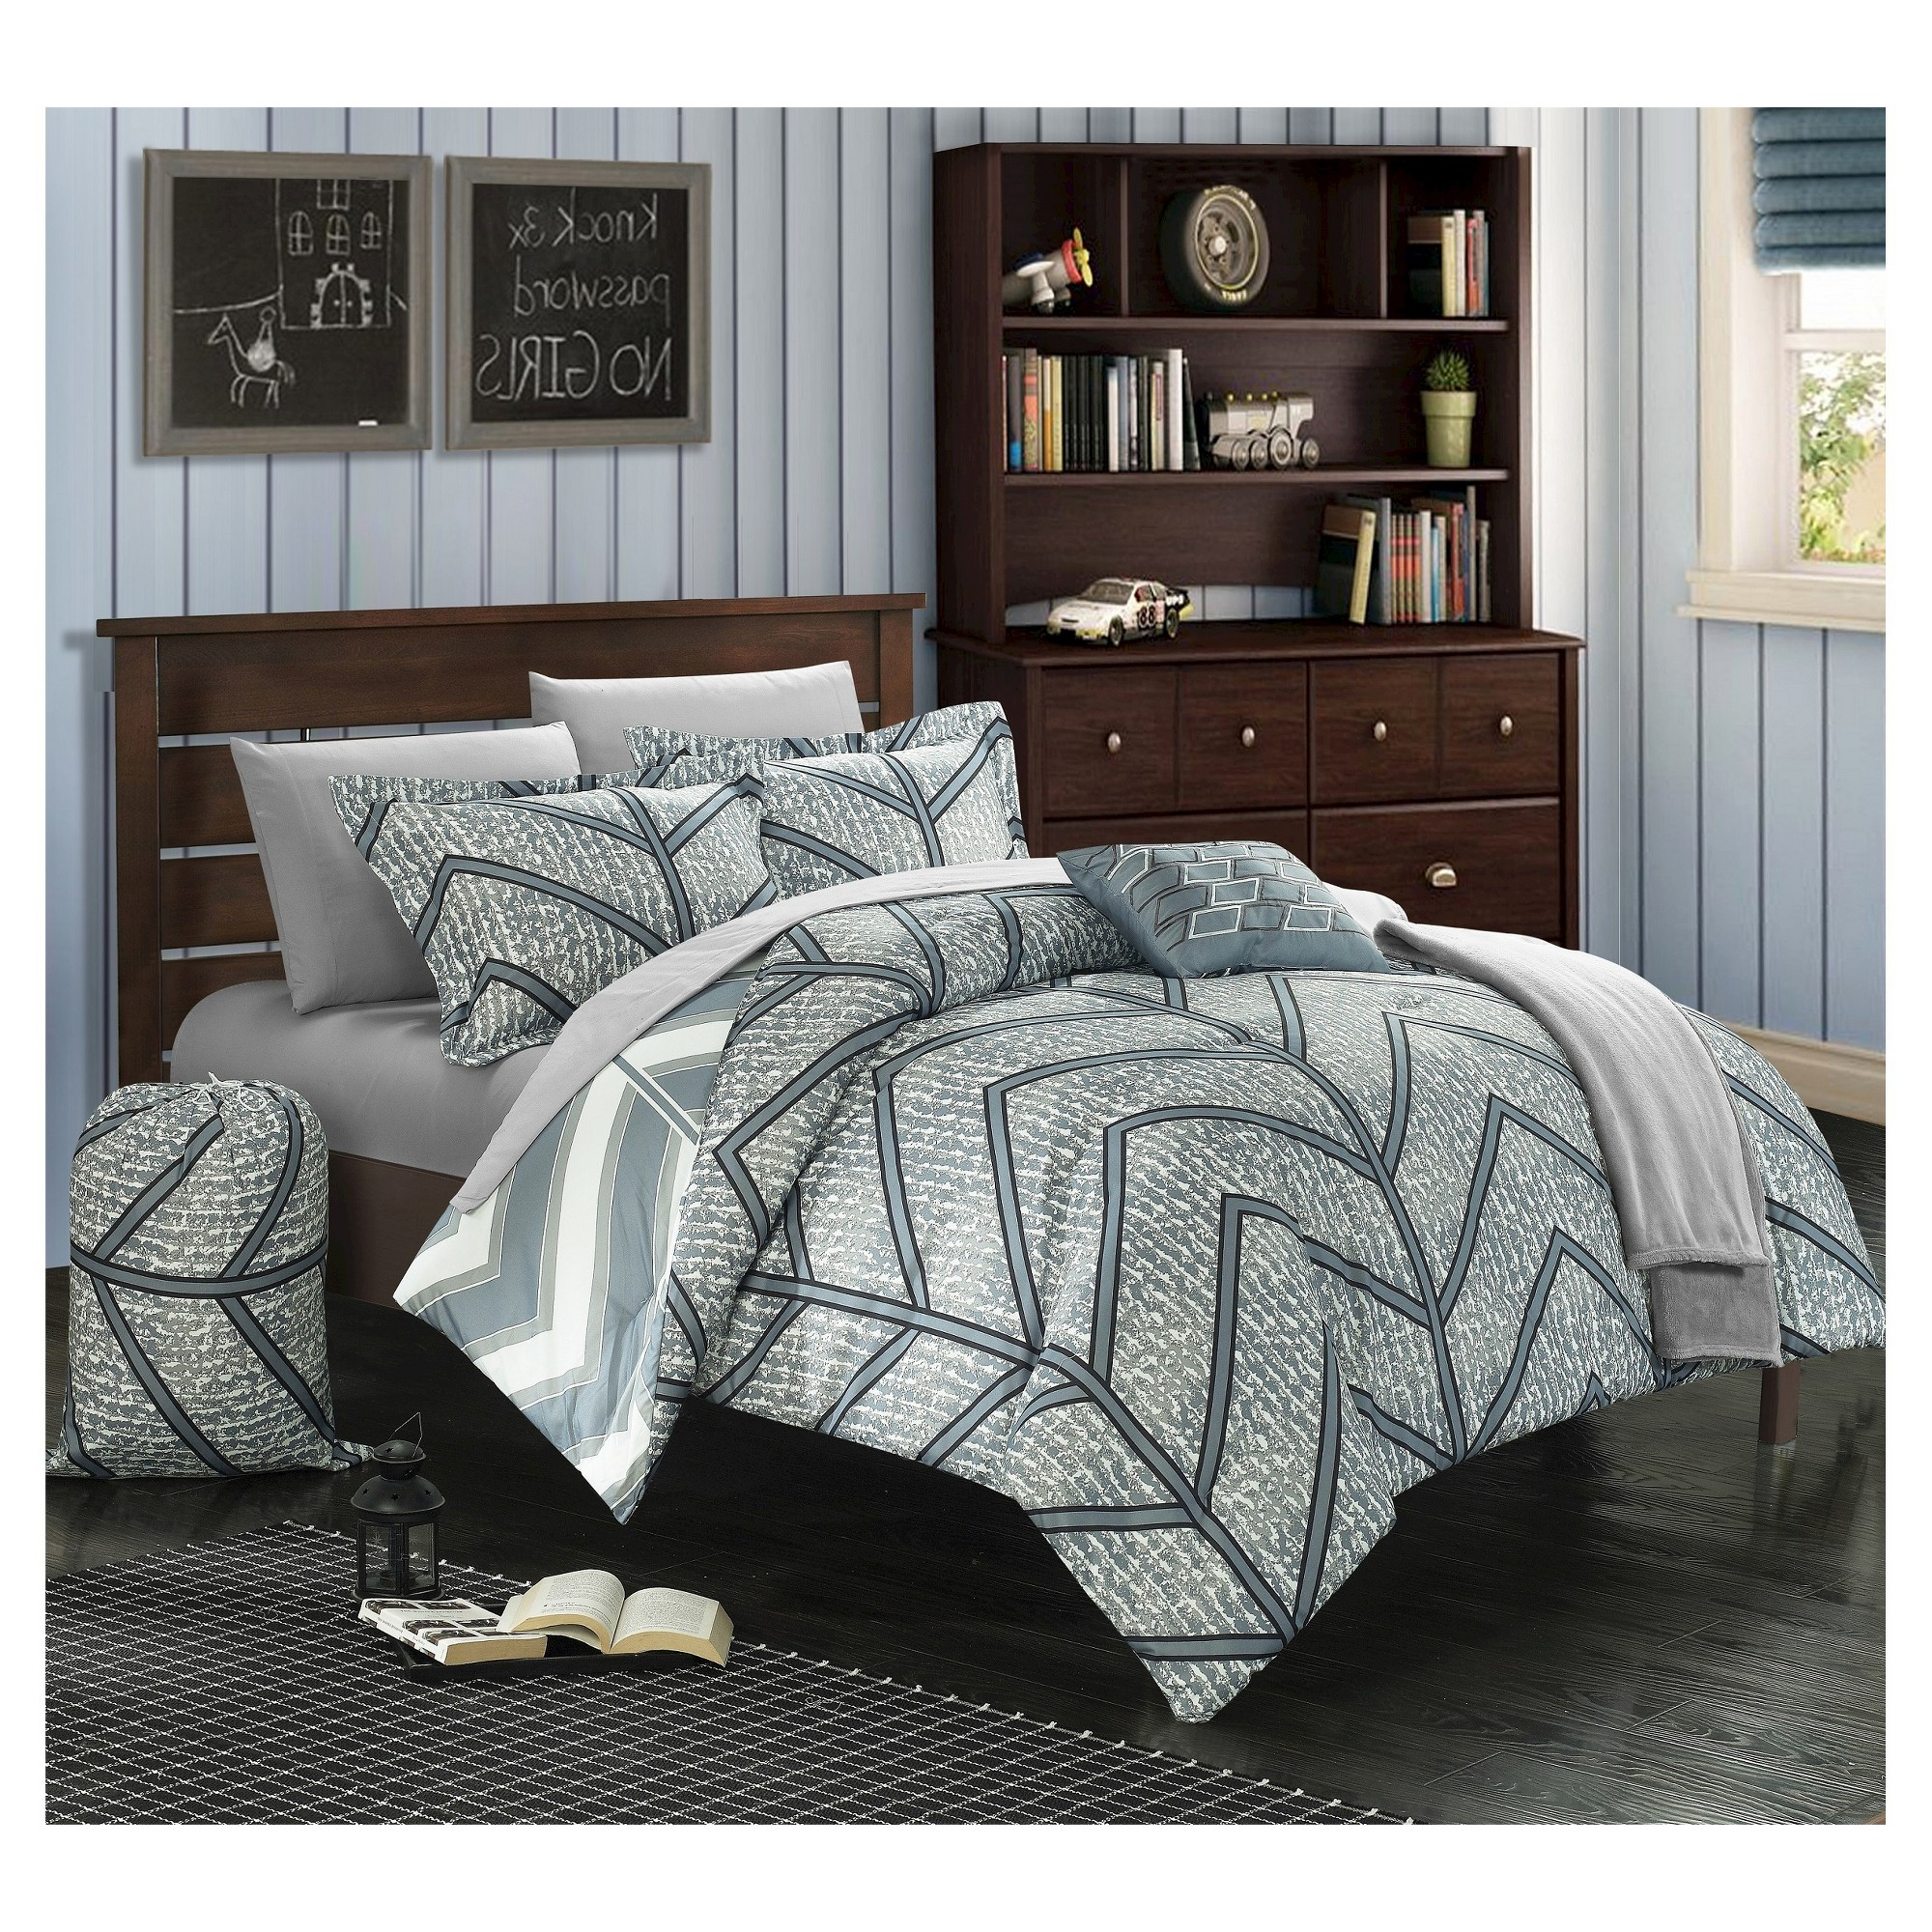 Amaretto Chevron And Geometric Printed Reversible Comforter Set 8 Piece  (Twin XL) Gray